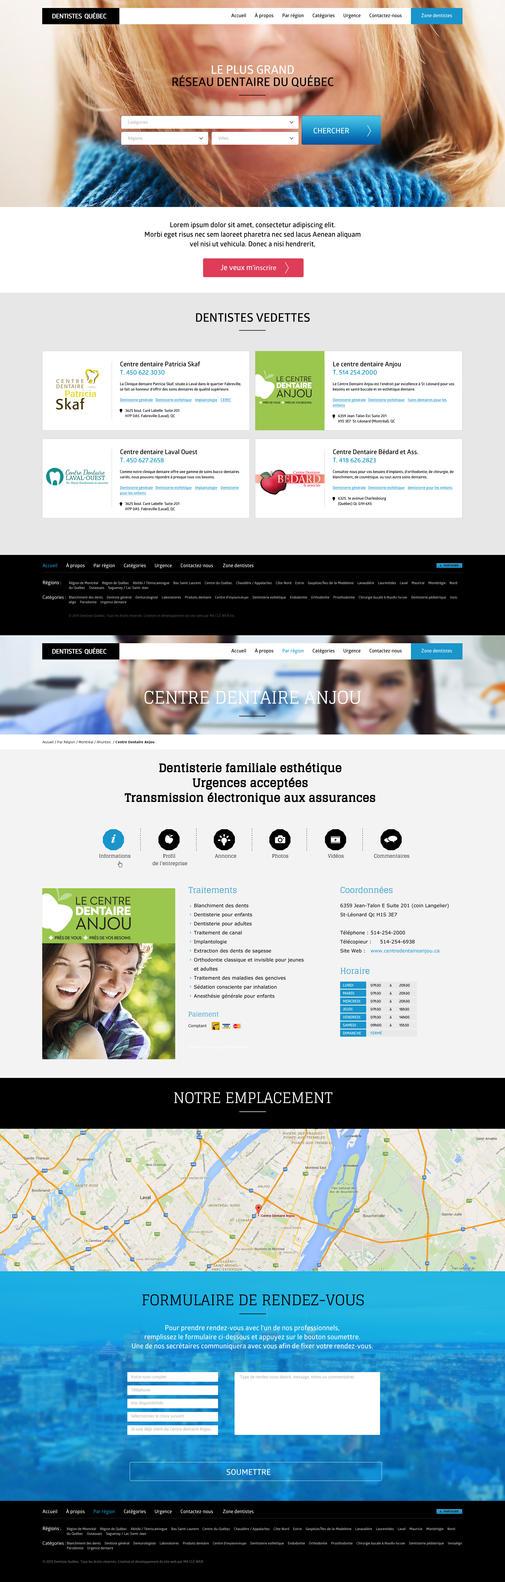 Reseau dentistes by Webdesignerps